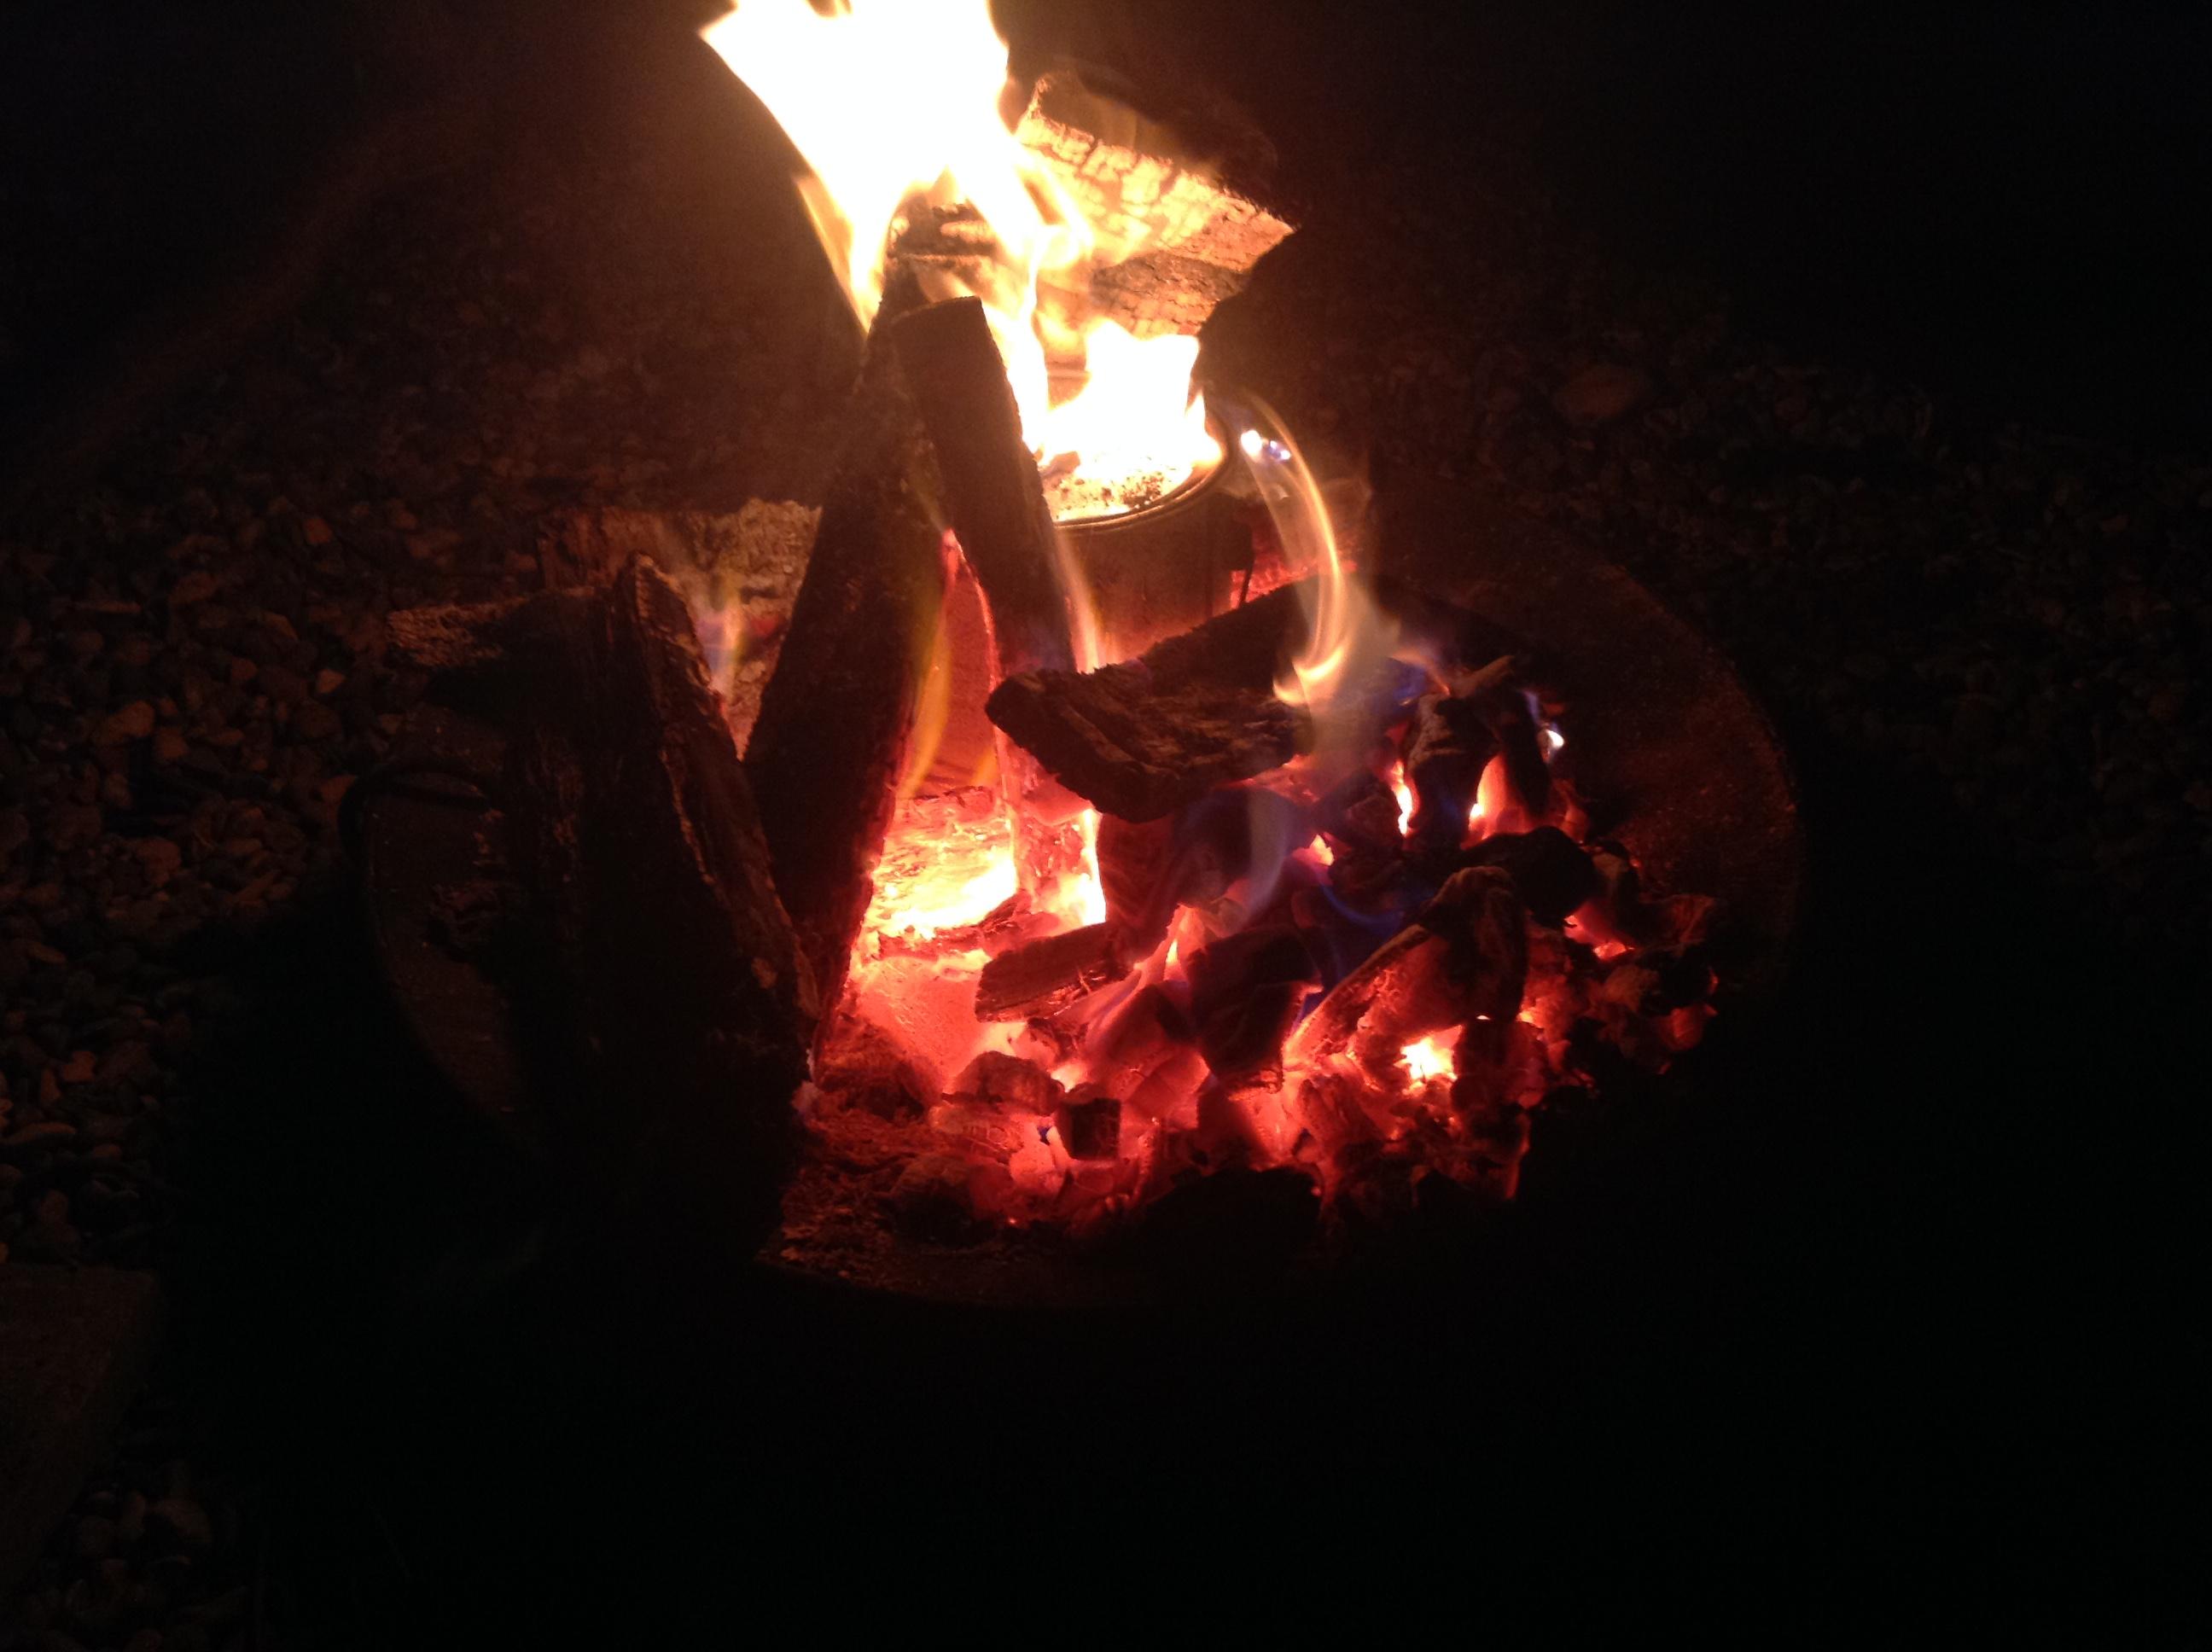 Creating charcoal